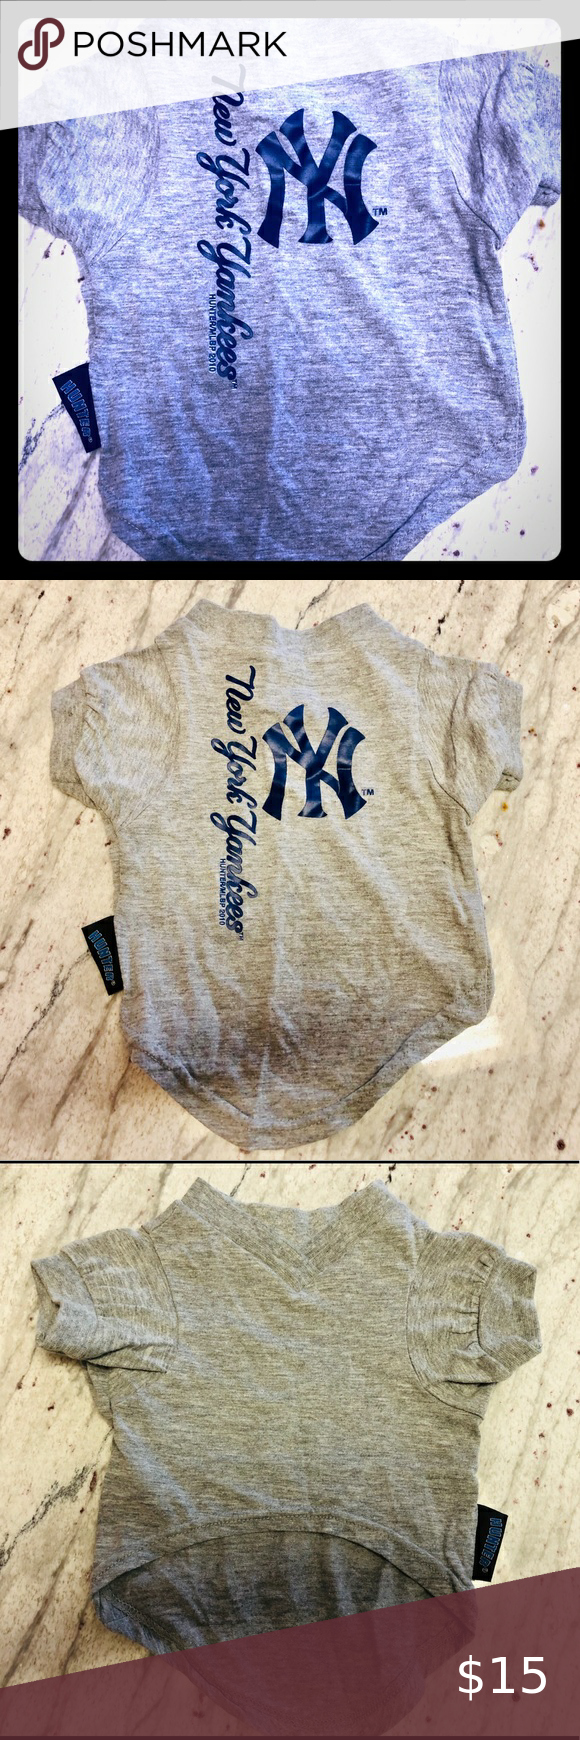 NY Yankees grey and blue dog T-shirt size small